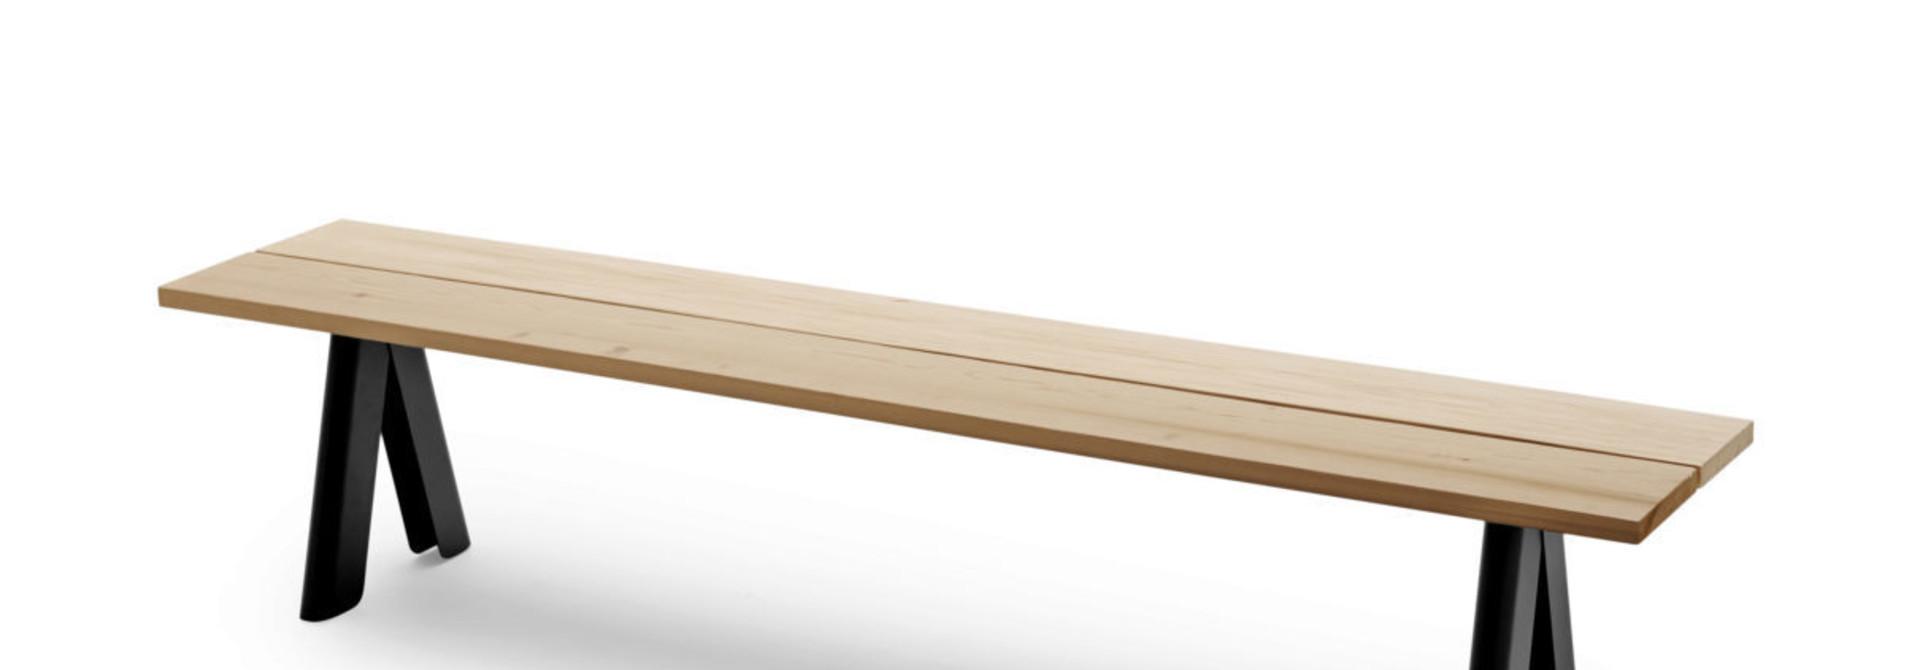 Overlap Bench